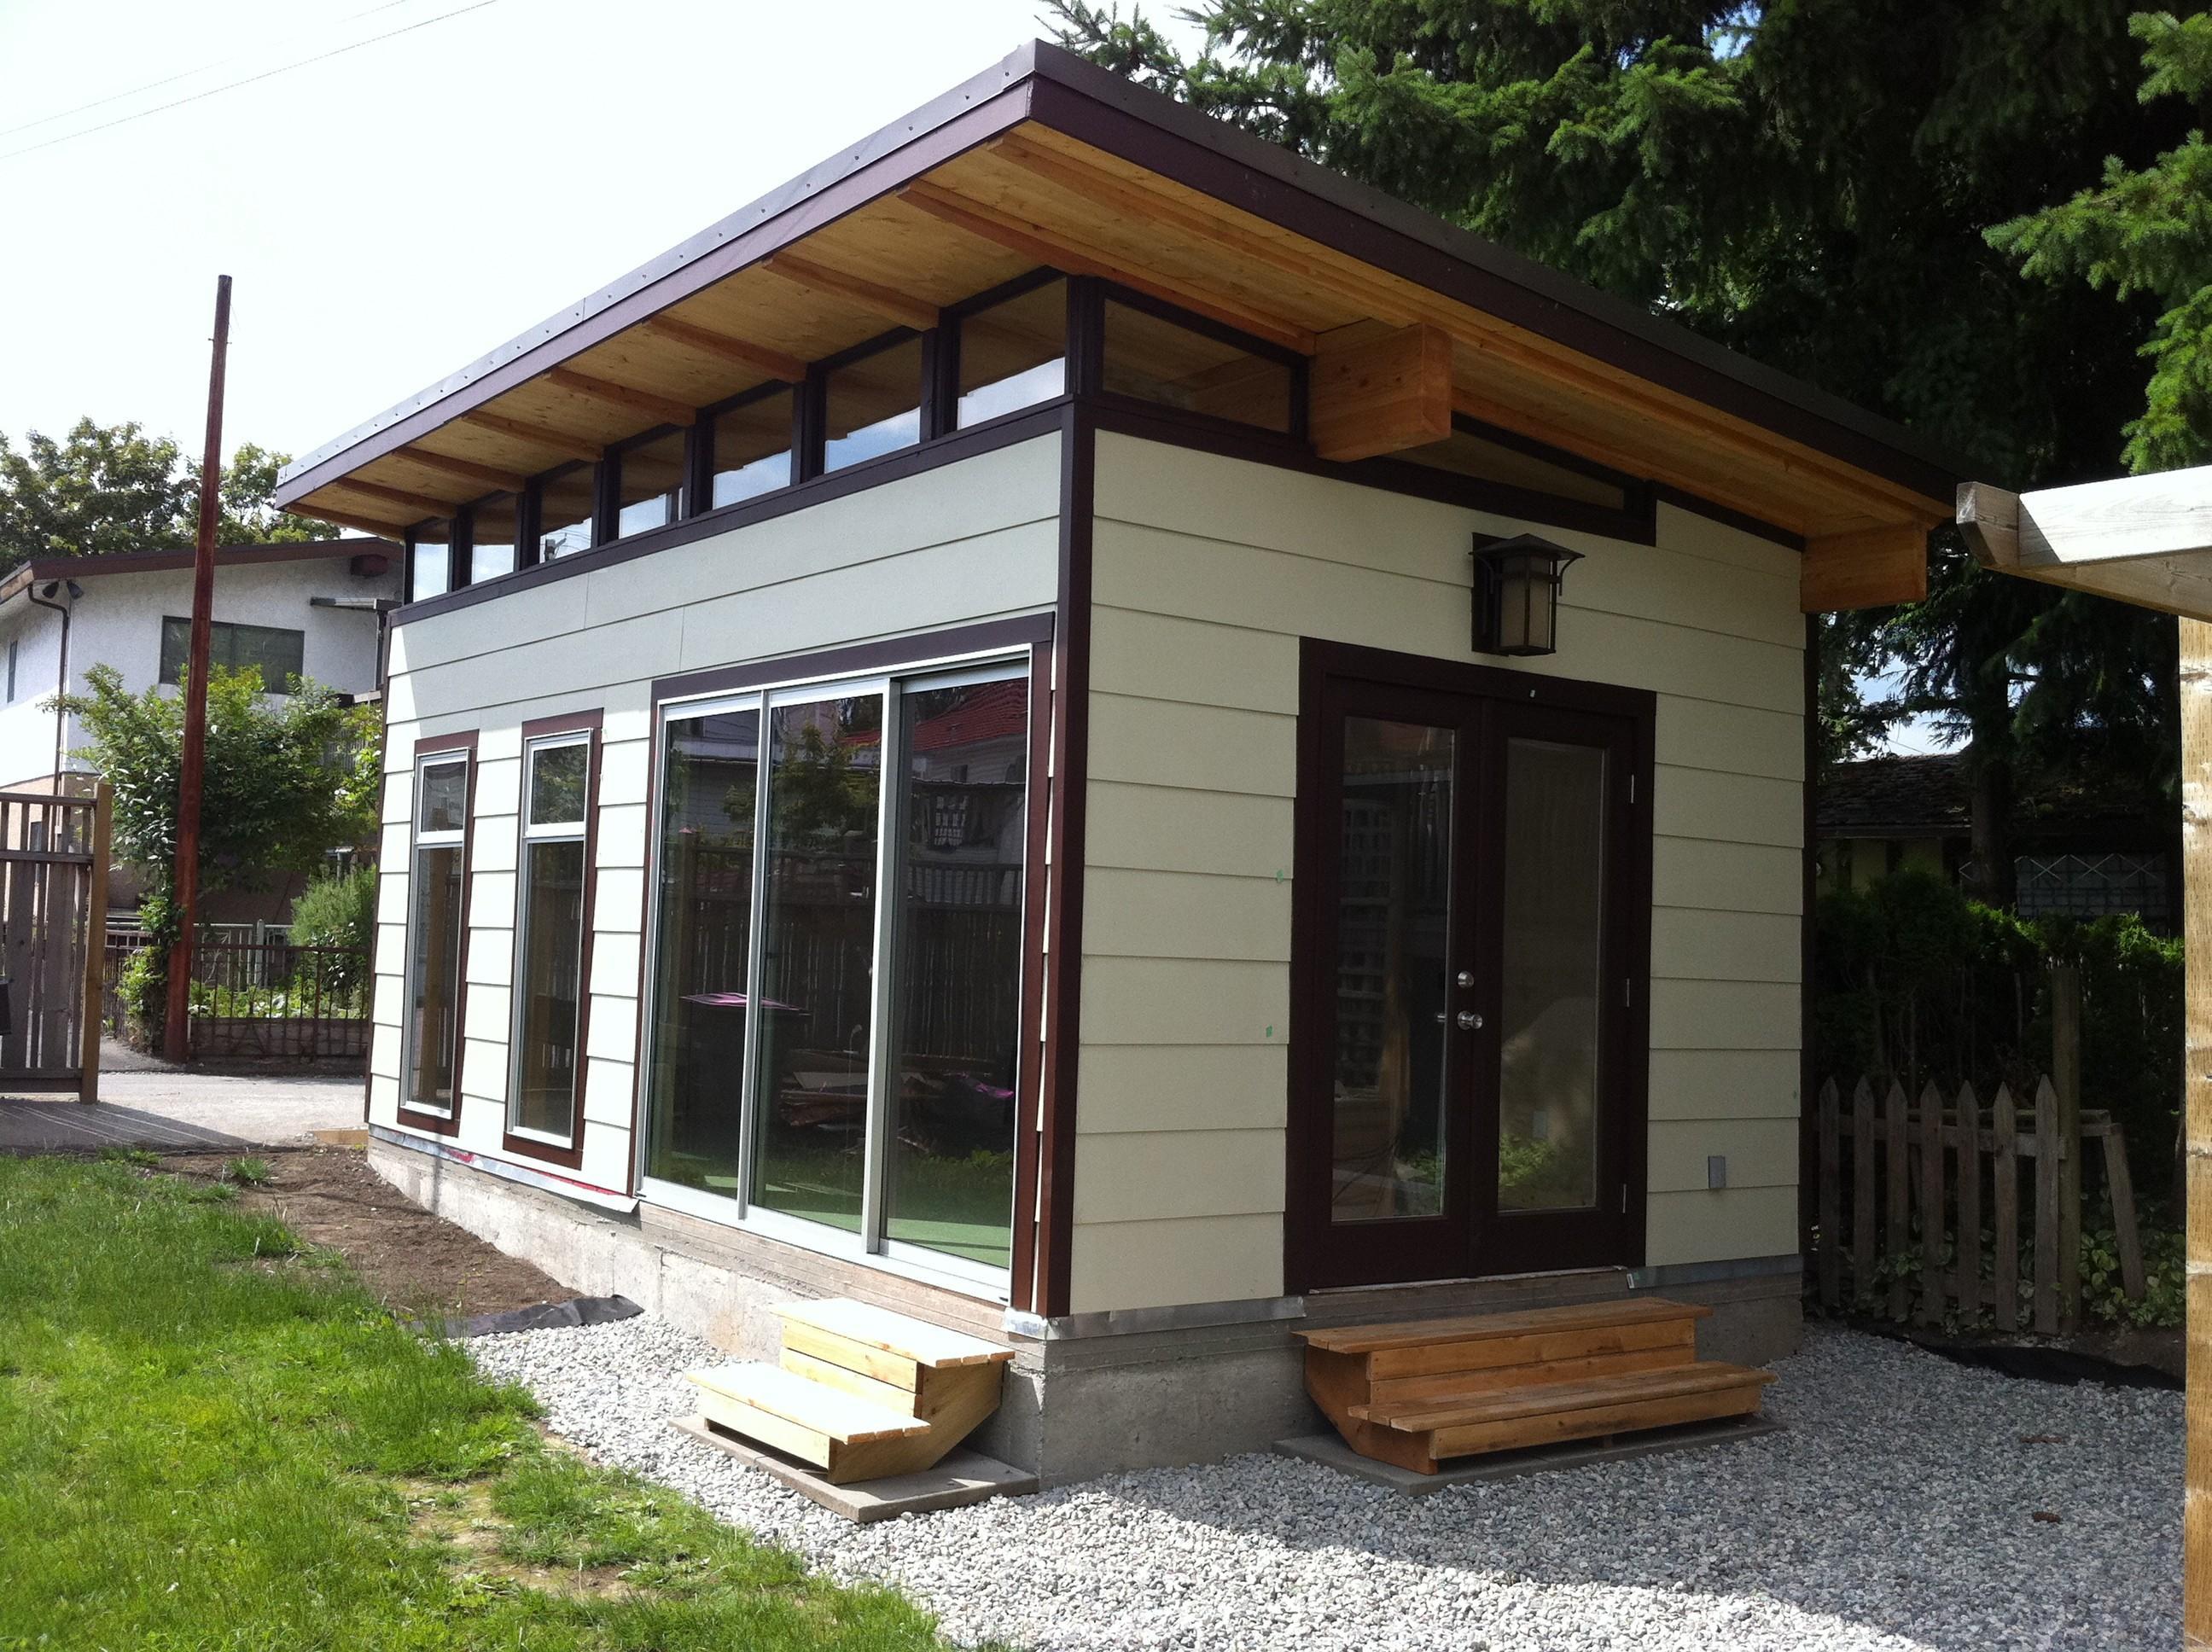 Prefab Garage Kit Coastal Modern Shed Decoratorist 47608